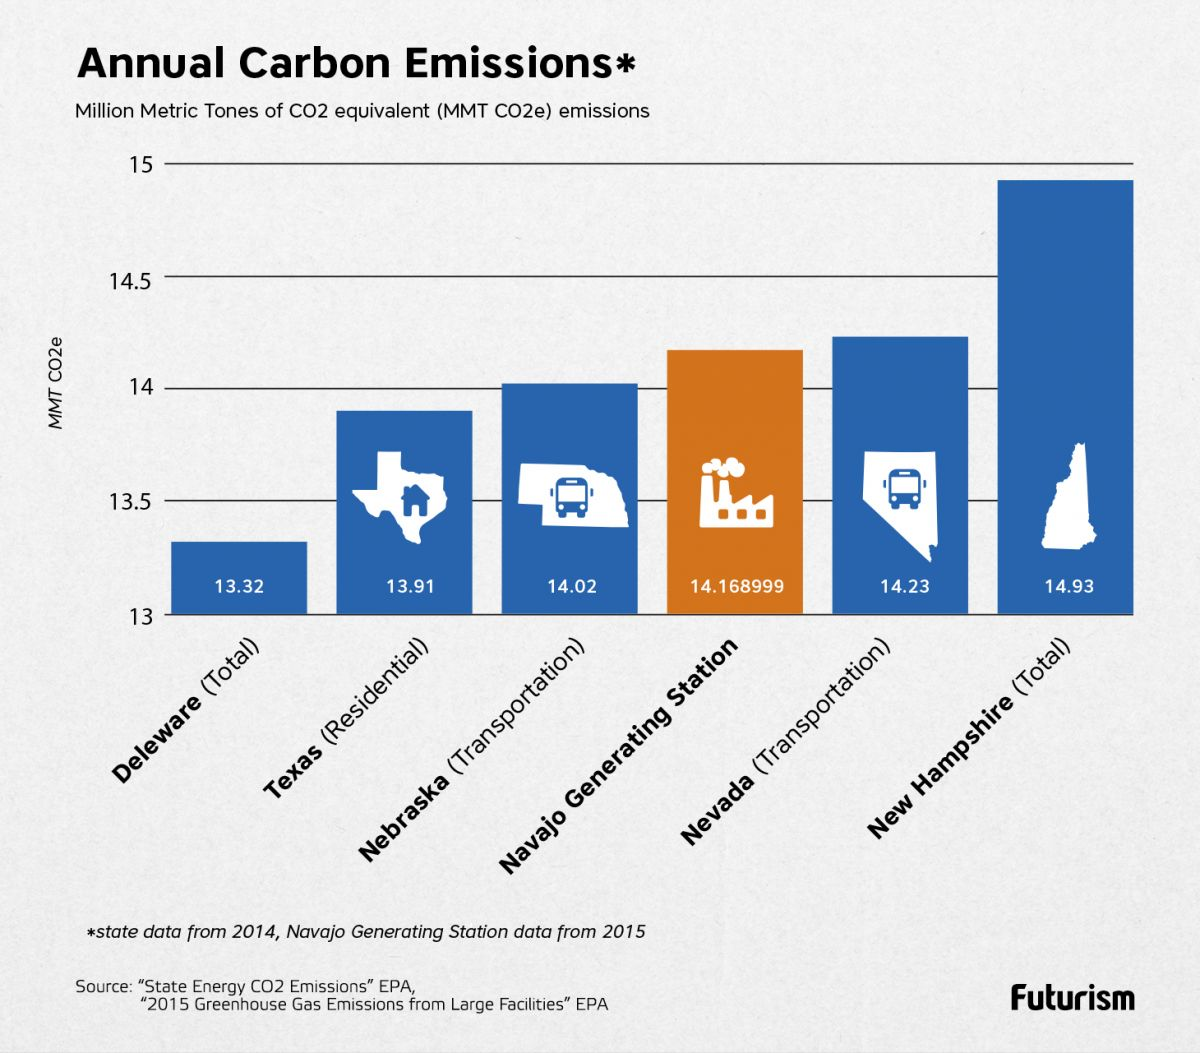 Carbon_Emissions_Comparison_V2